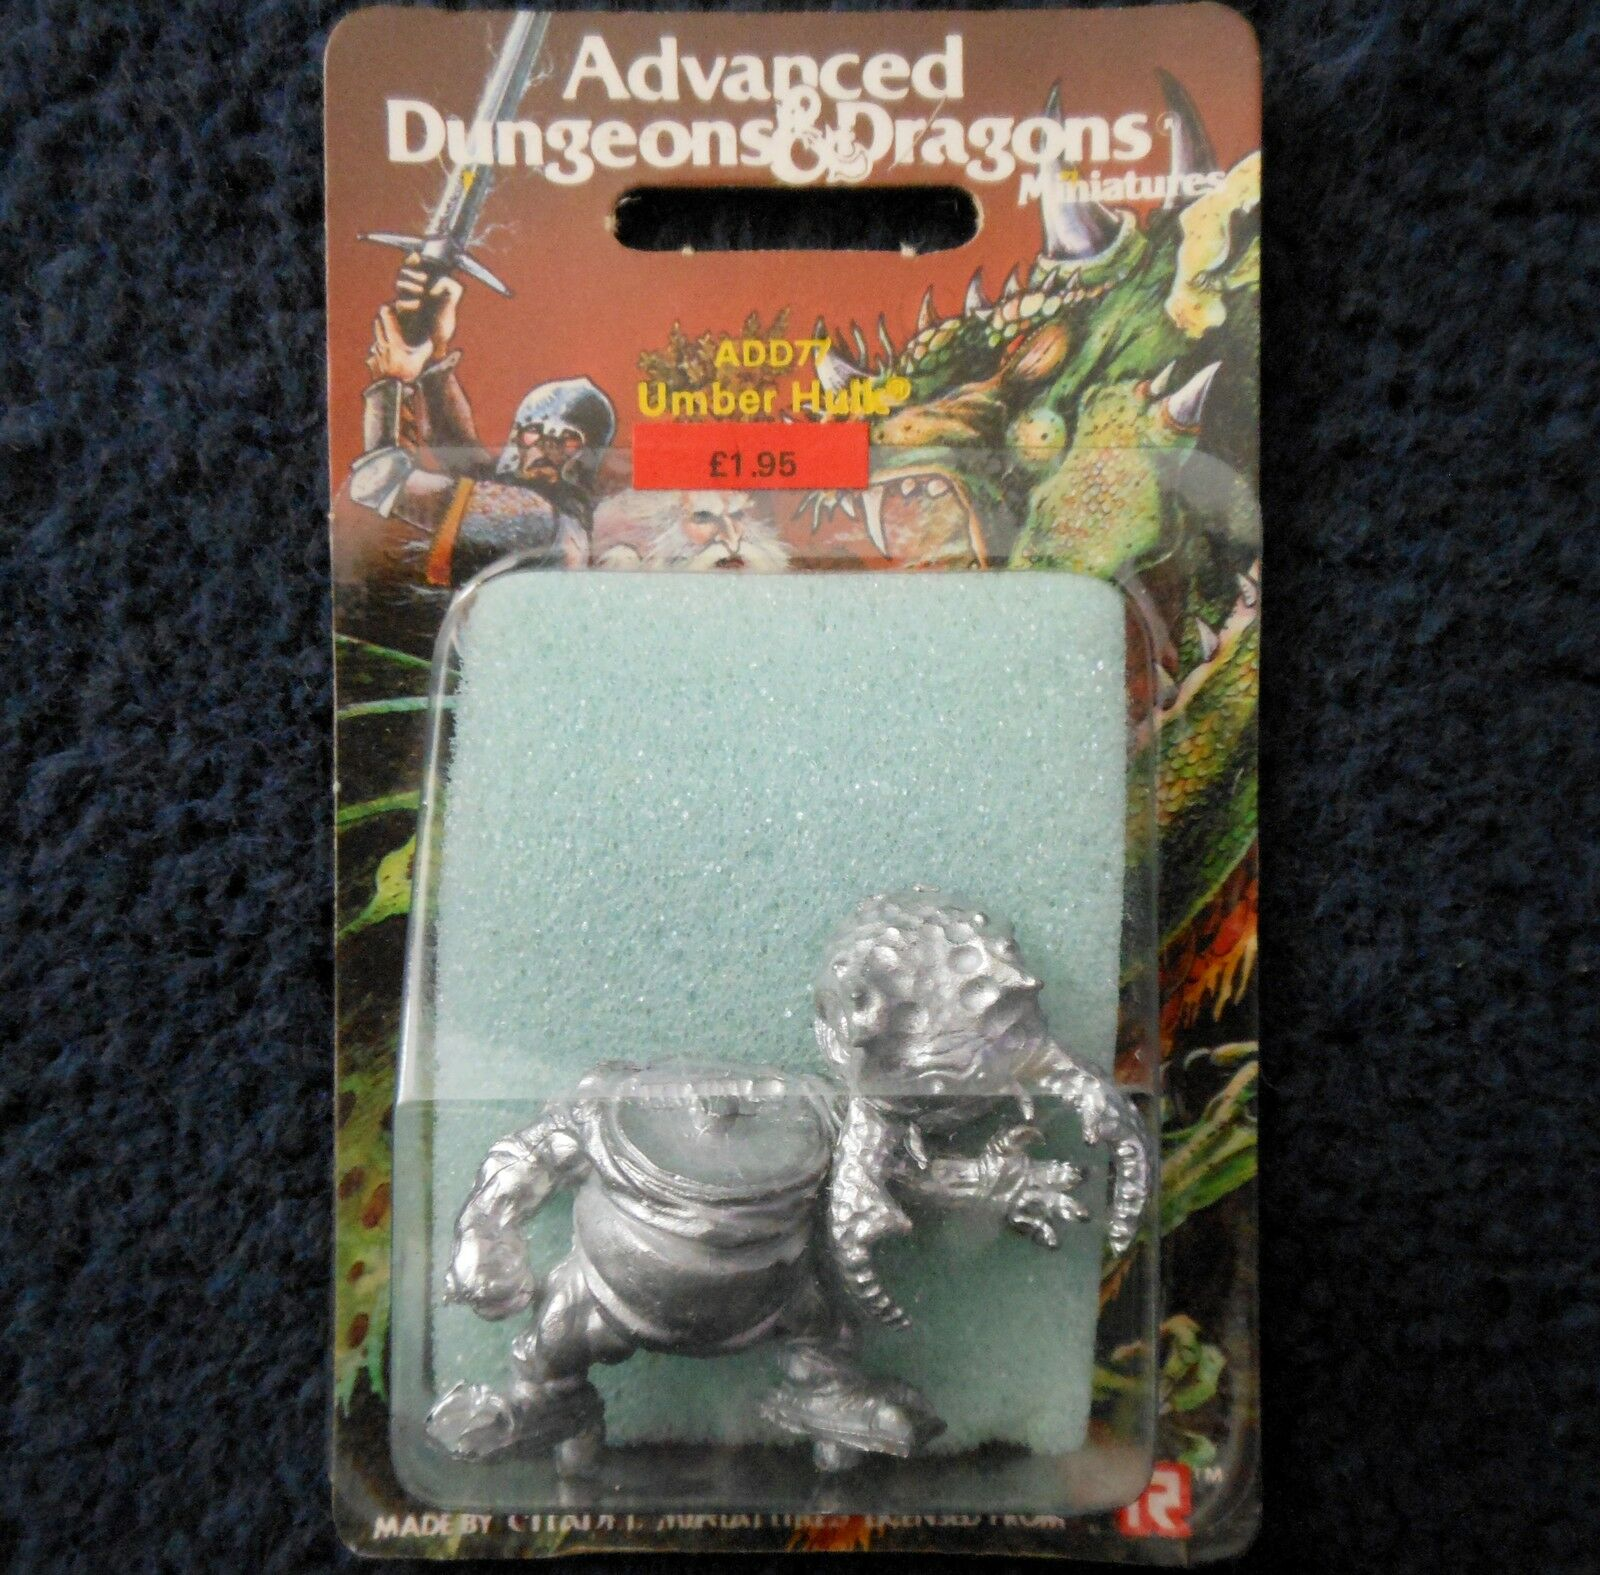 1985 ADD77 Umber Hulk V2 Advanced Dungeons & Dragons Games Workshop AD&D TSR MIB